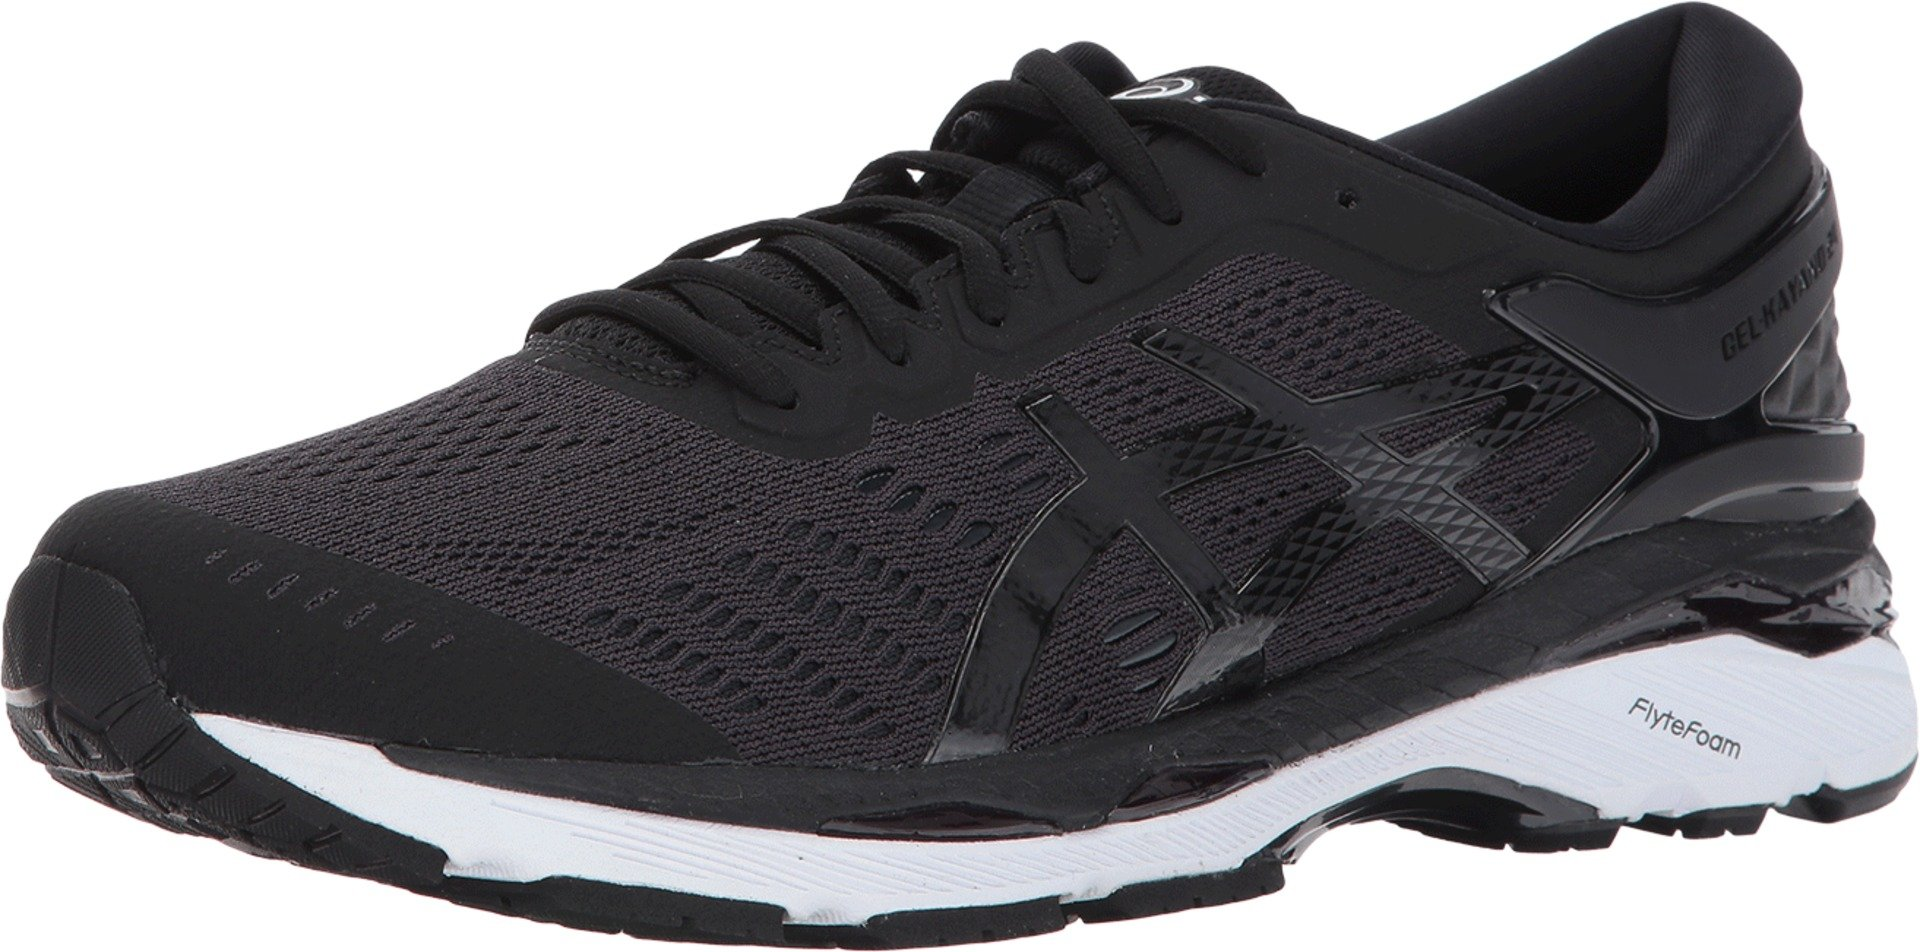 ASICS Mens Gel-Kayano 24 Running Shoe, Black/Phantom/White, 6.5 Medium US